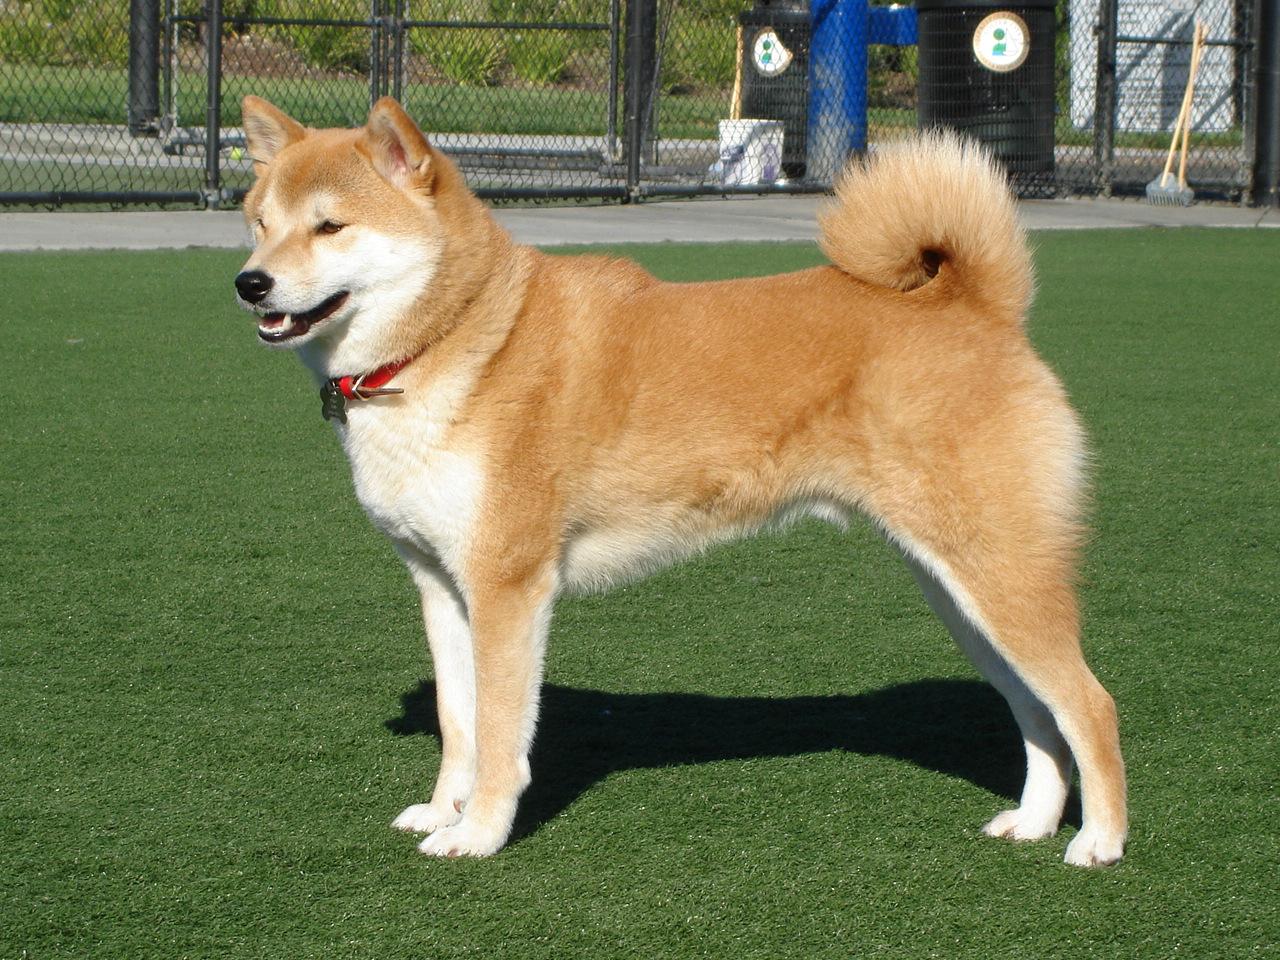 akita dog akita dog breed american akita dog